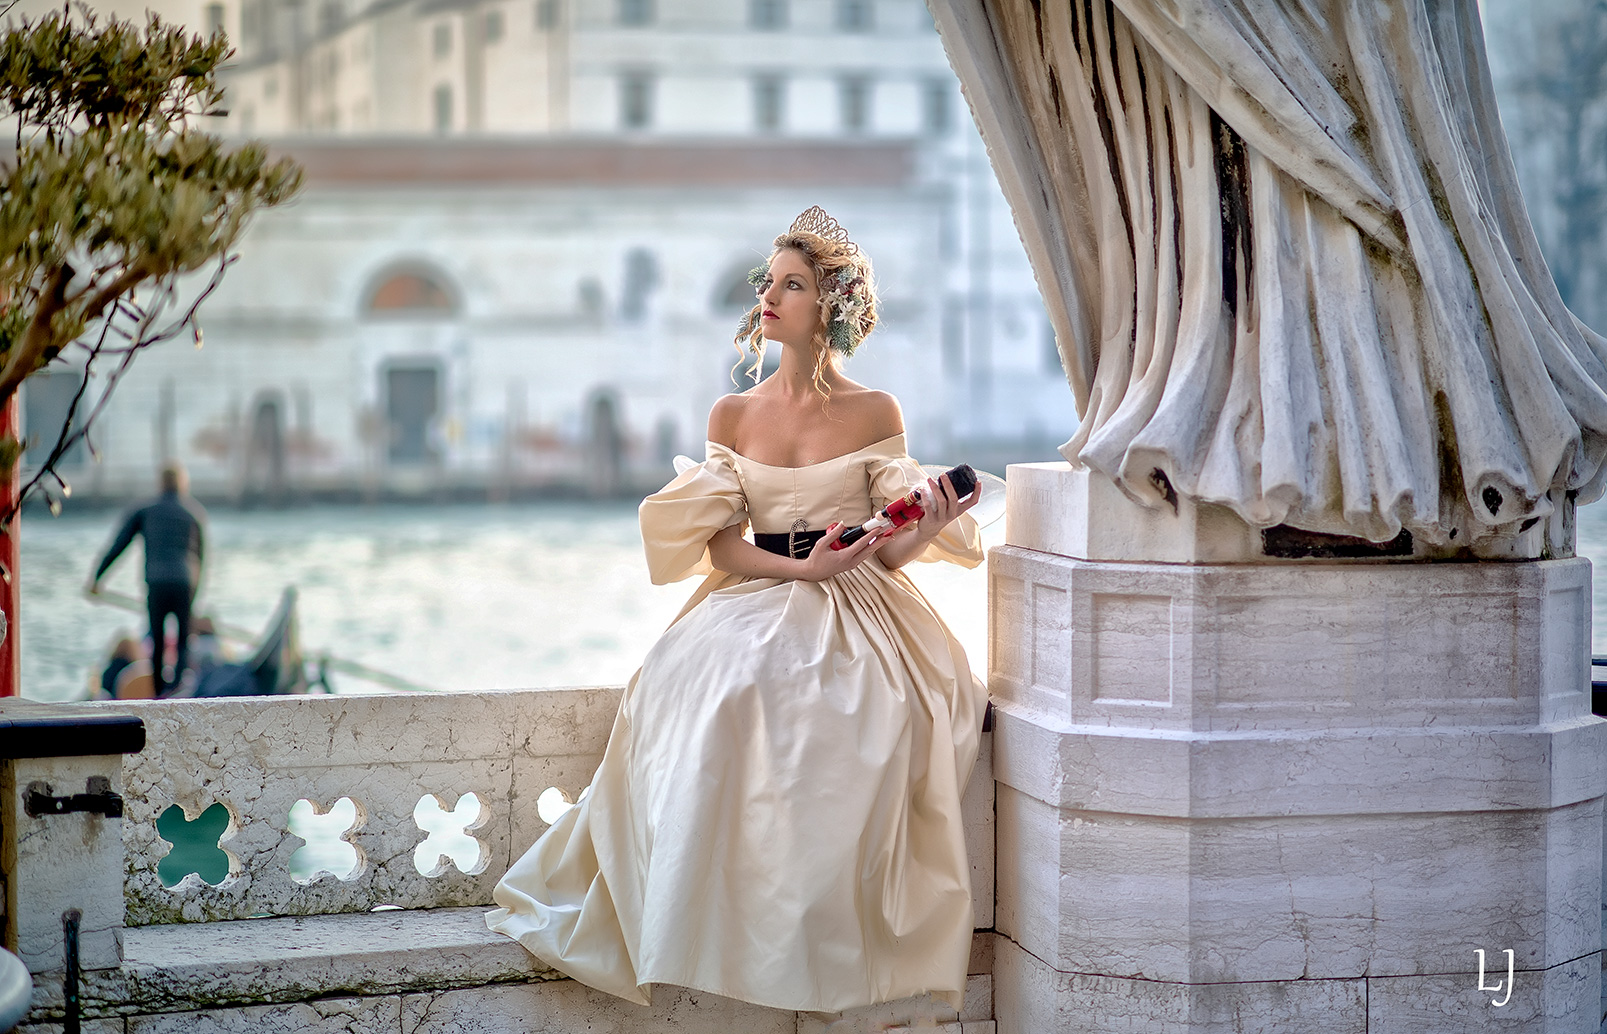 Fasion-model-italie-photographe-venise (